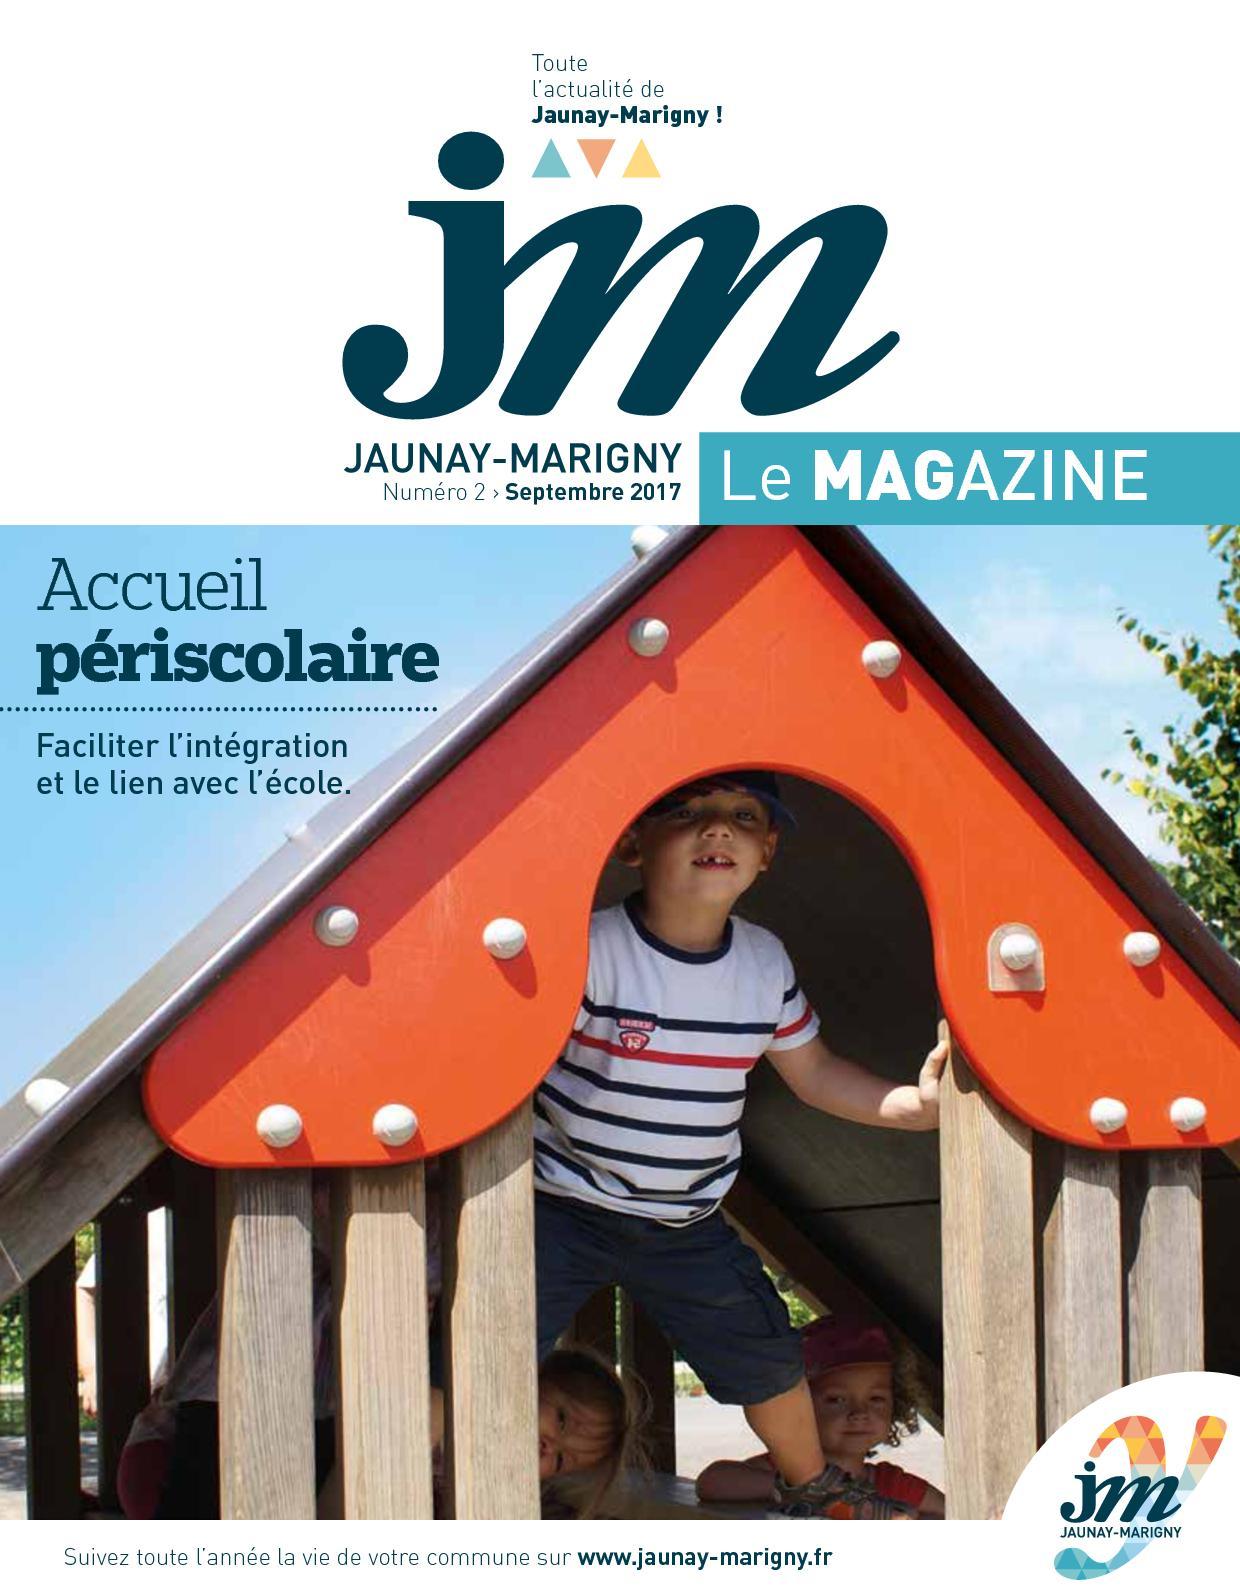 calam�o - jaunay-marigny, le magazine n�2